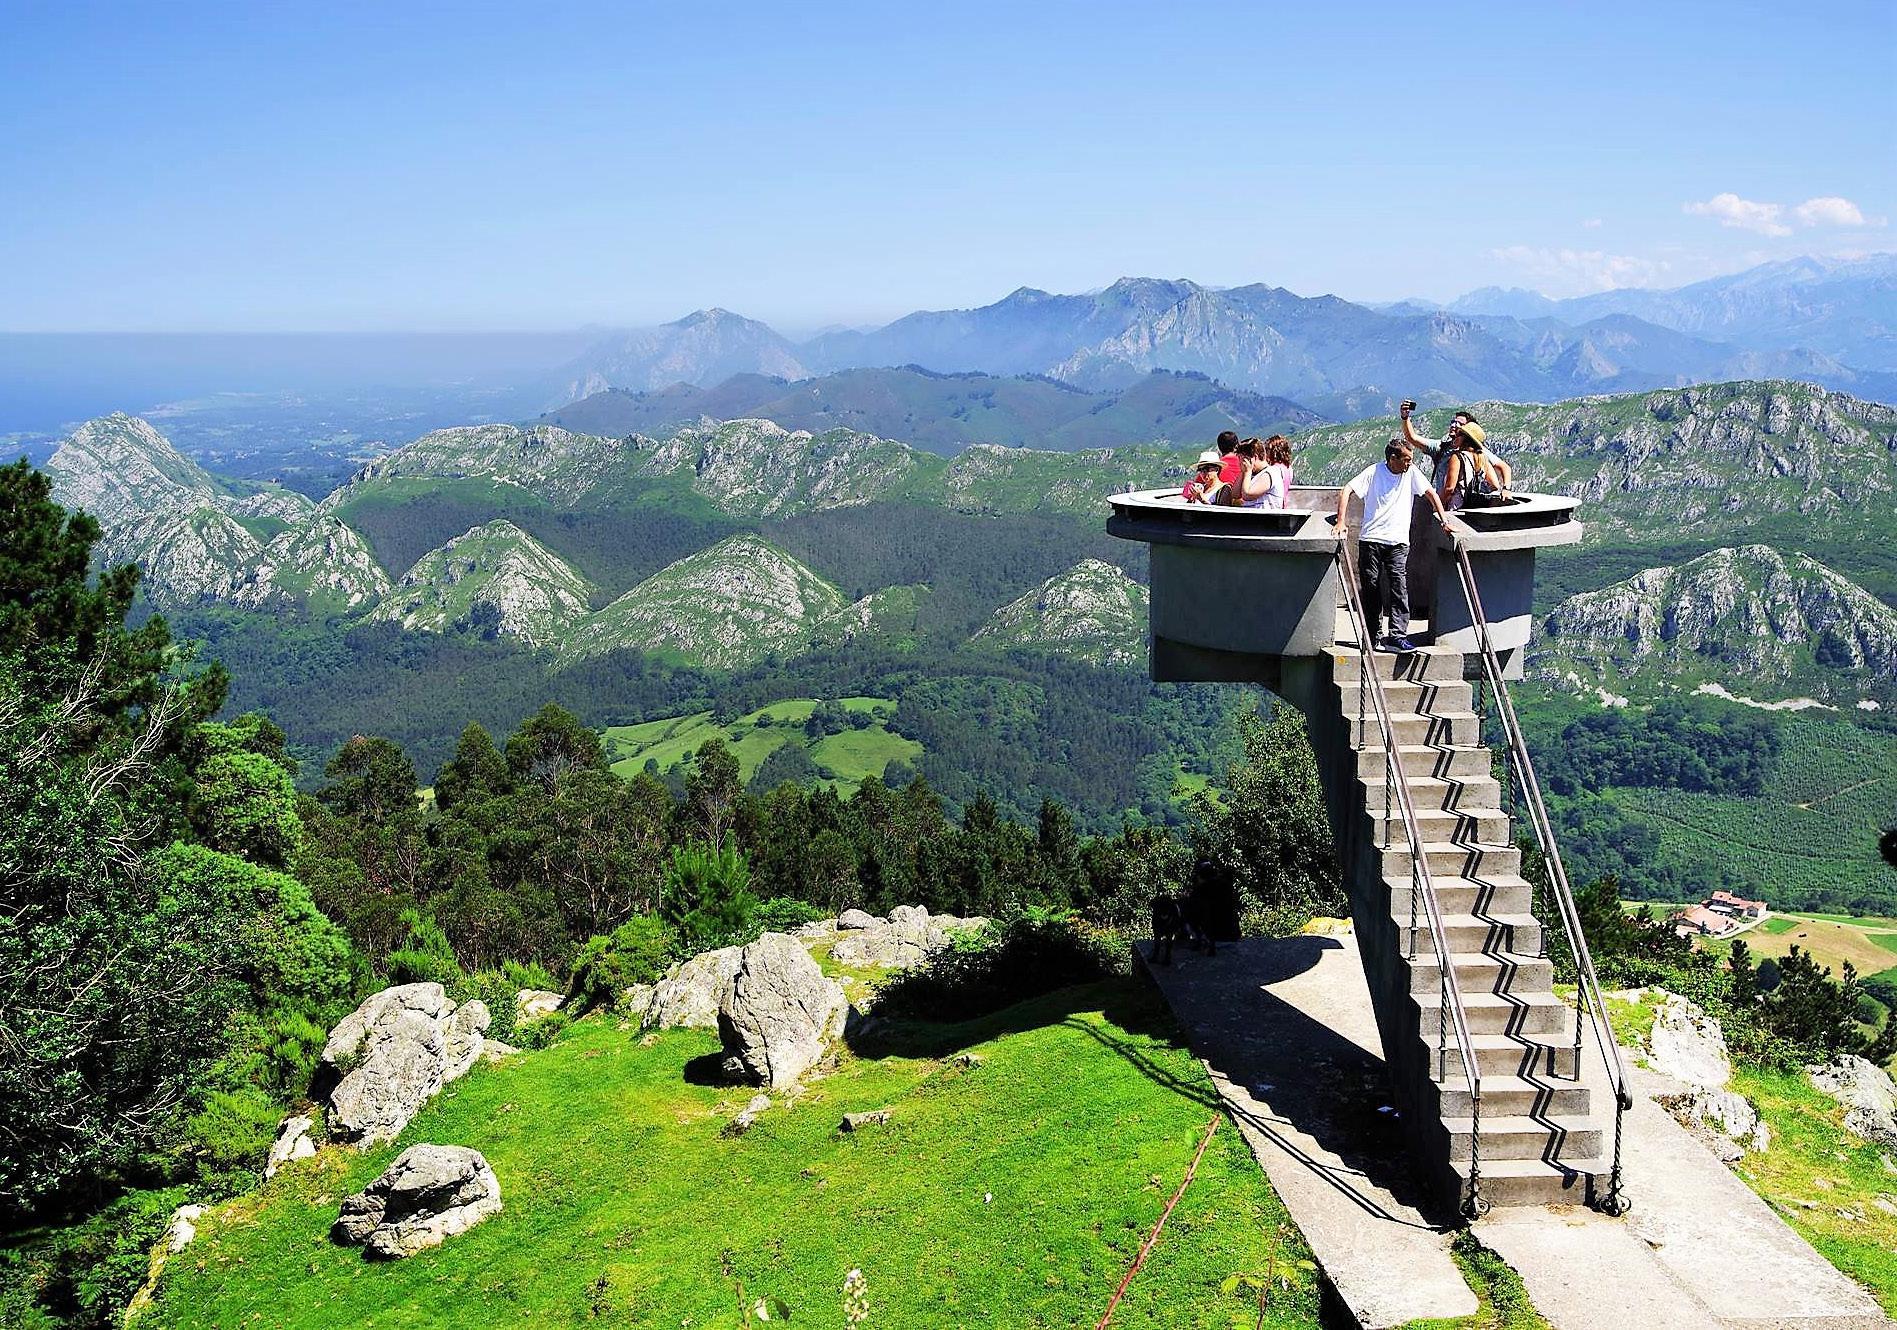 Page 50 of Cangas de Onis: La Asturias eterna